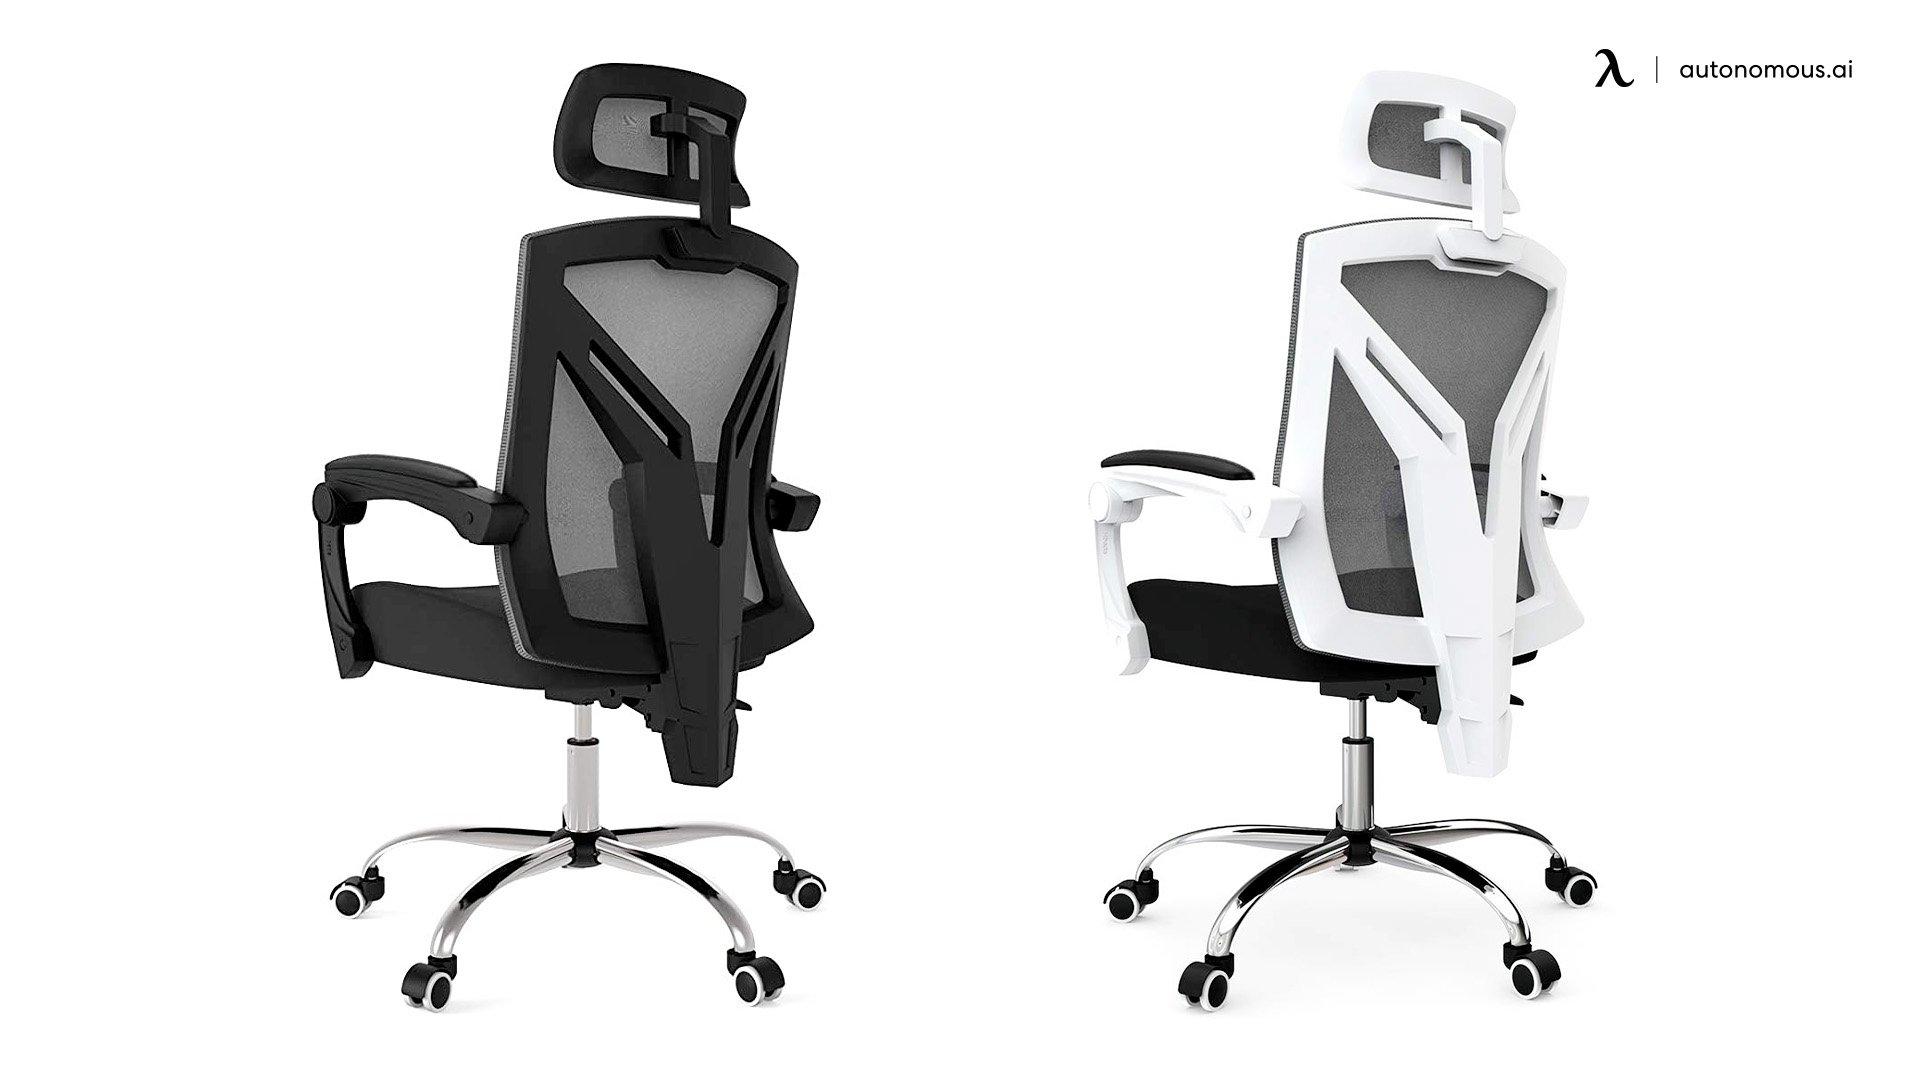 Hbada High-Back Desk Chair